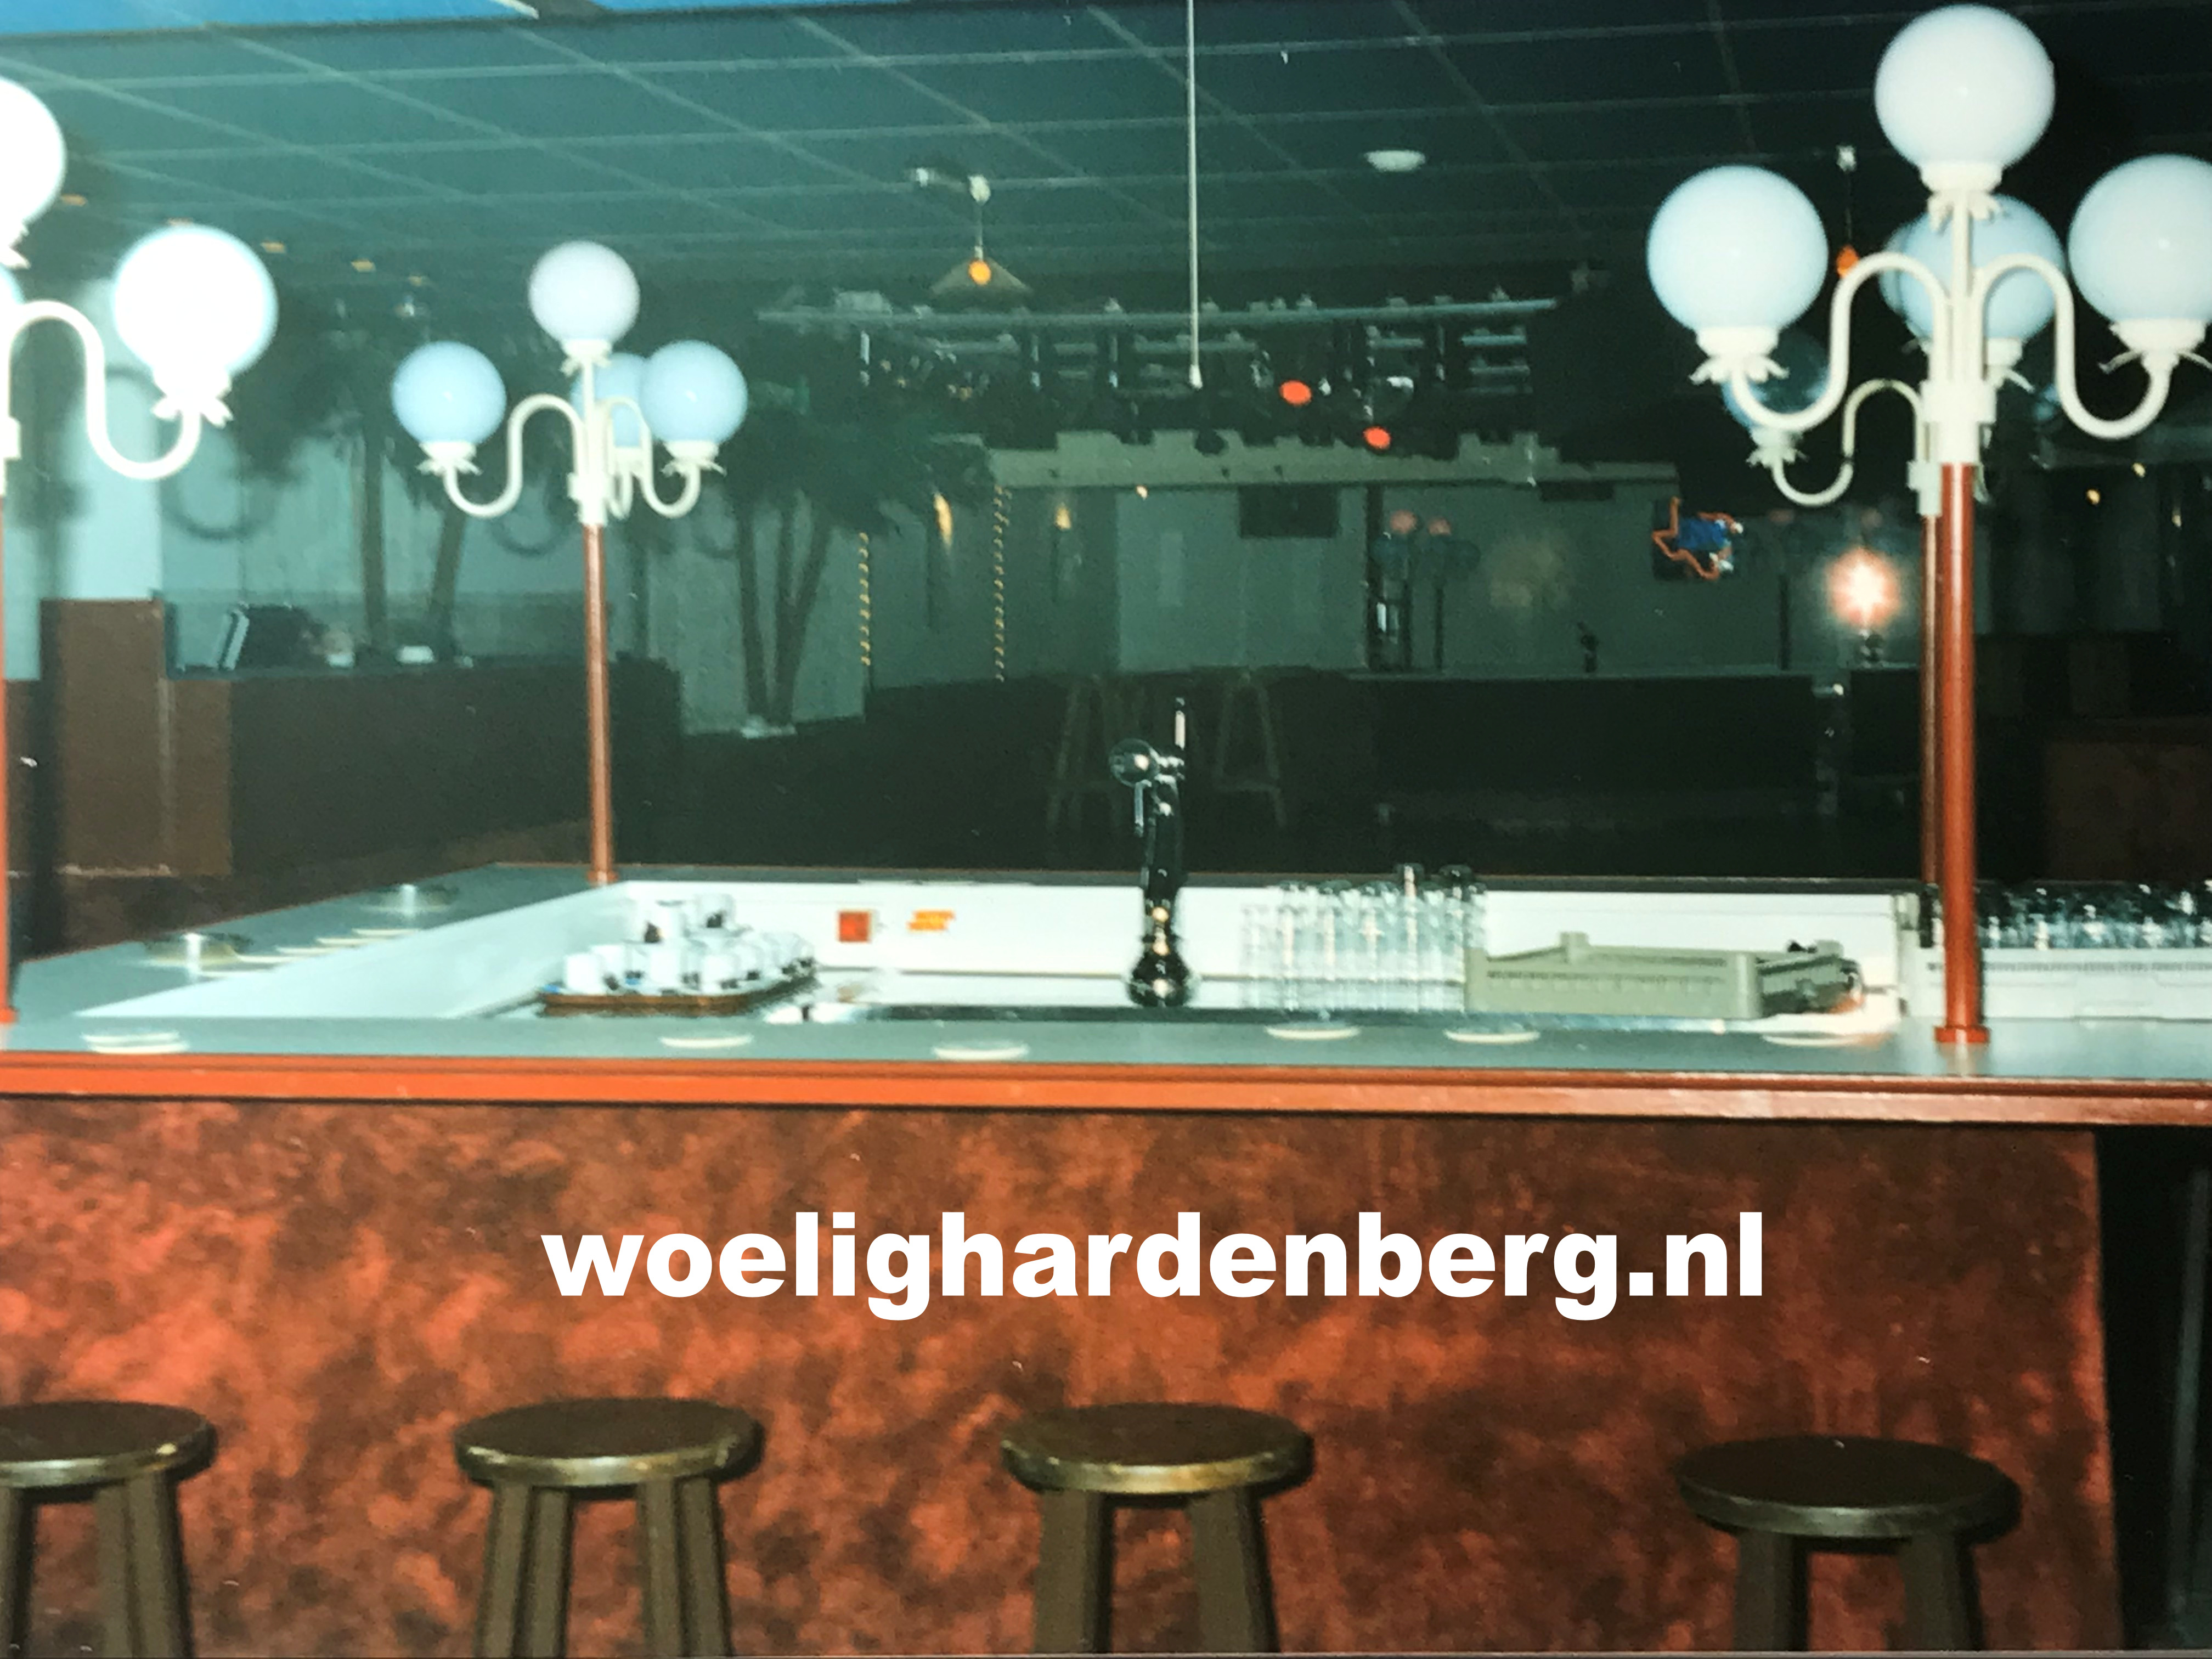 Celebration Hardenberg1